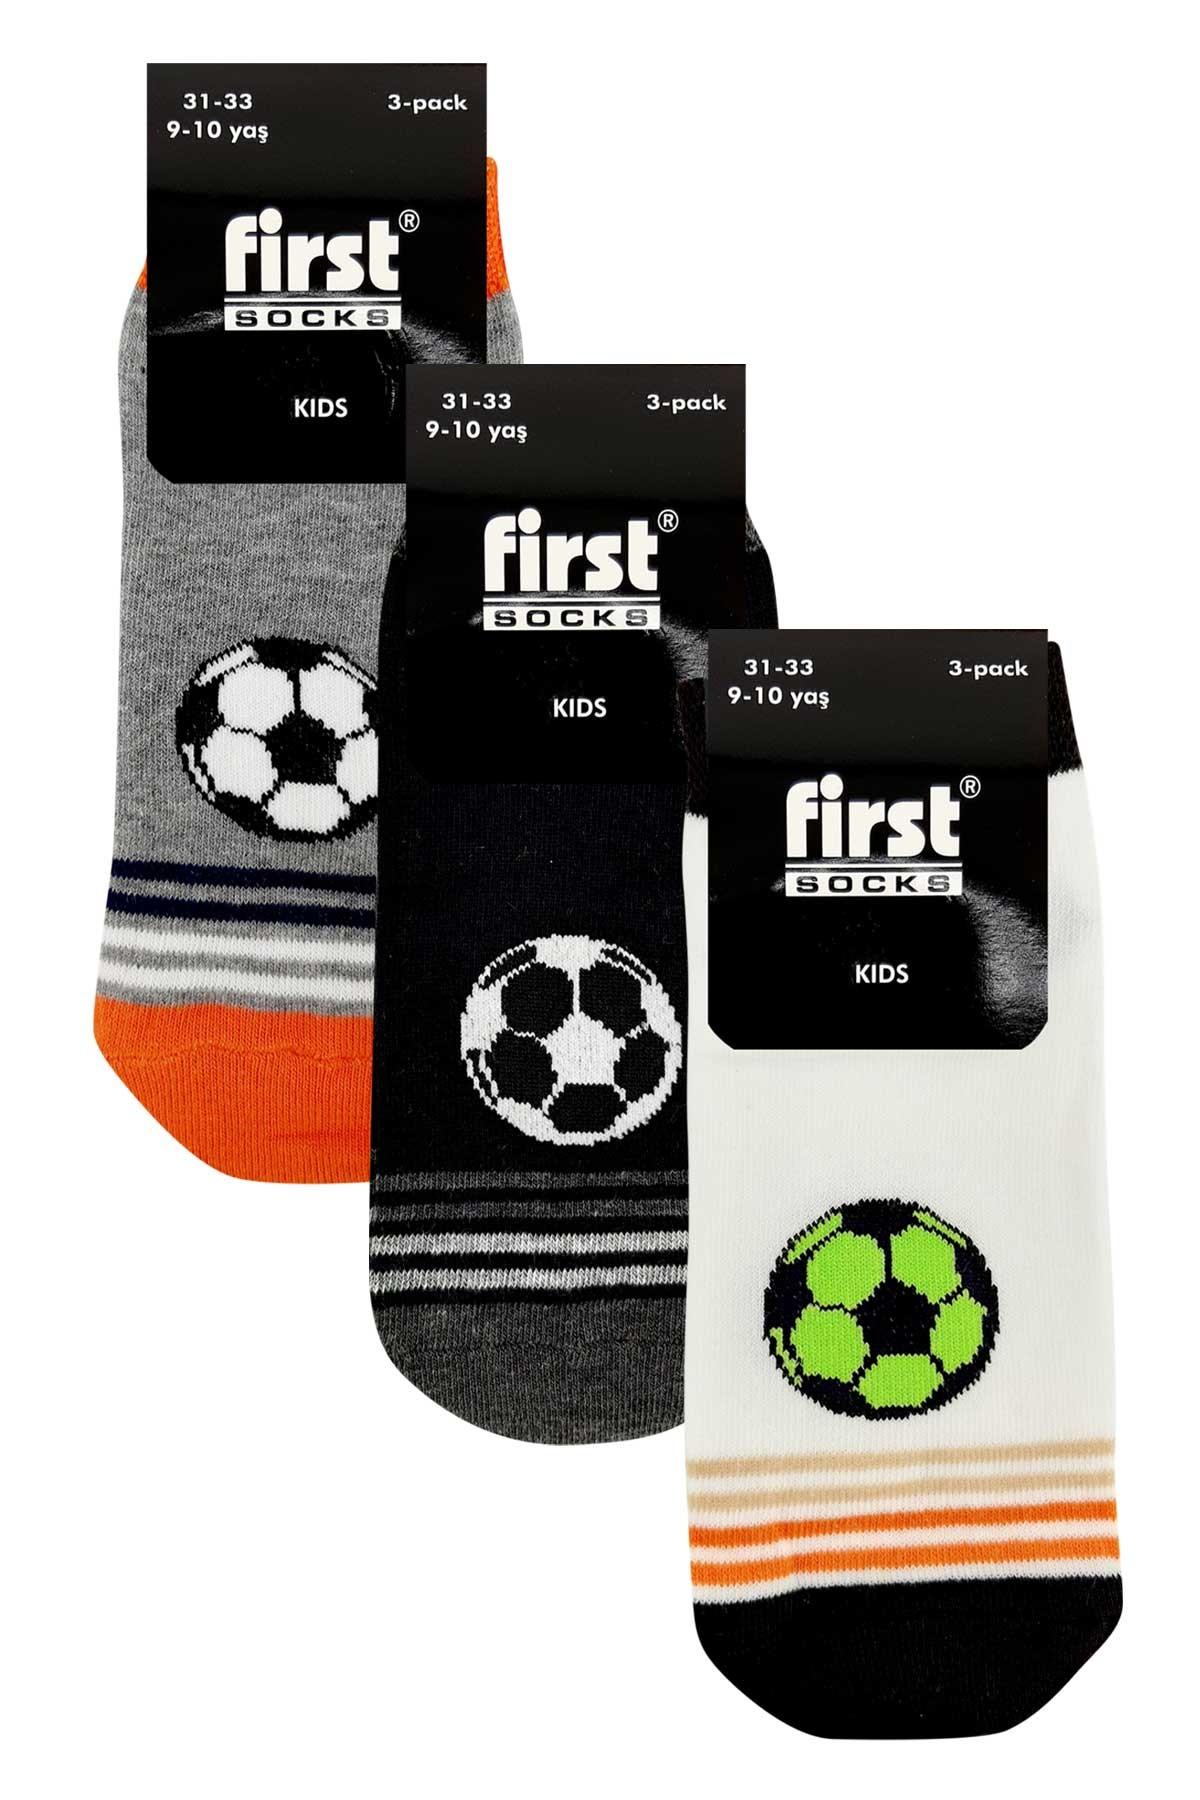 First Erkek Çocuk Patik Çorap Futbol Topu 3 lü - Asorti - 5 - Thumbnail